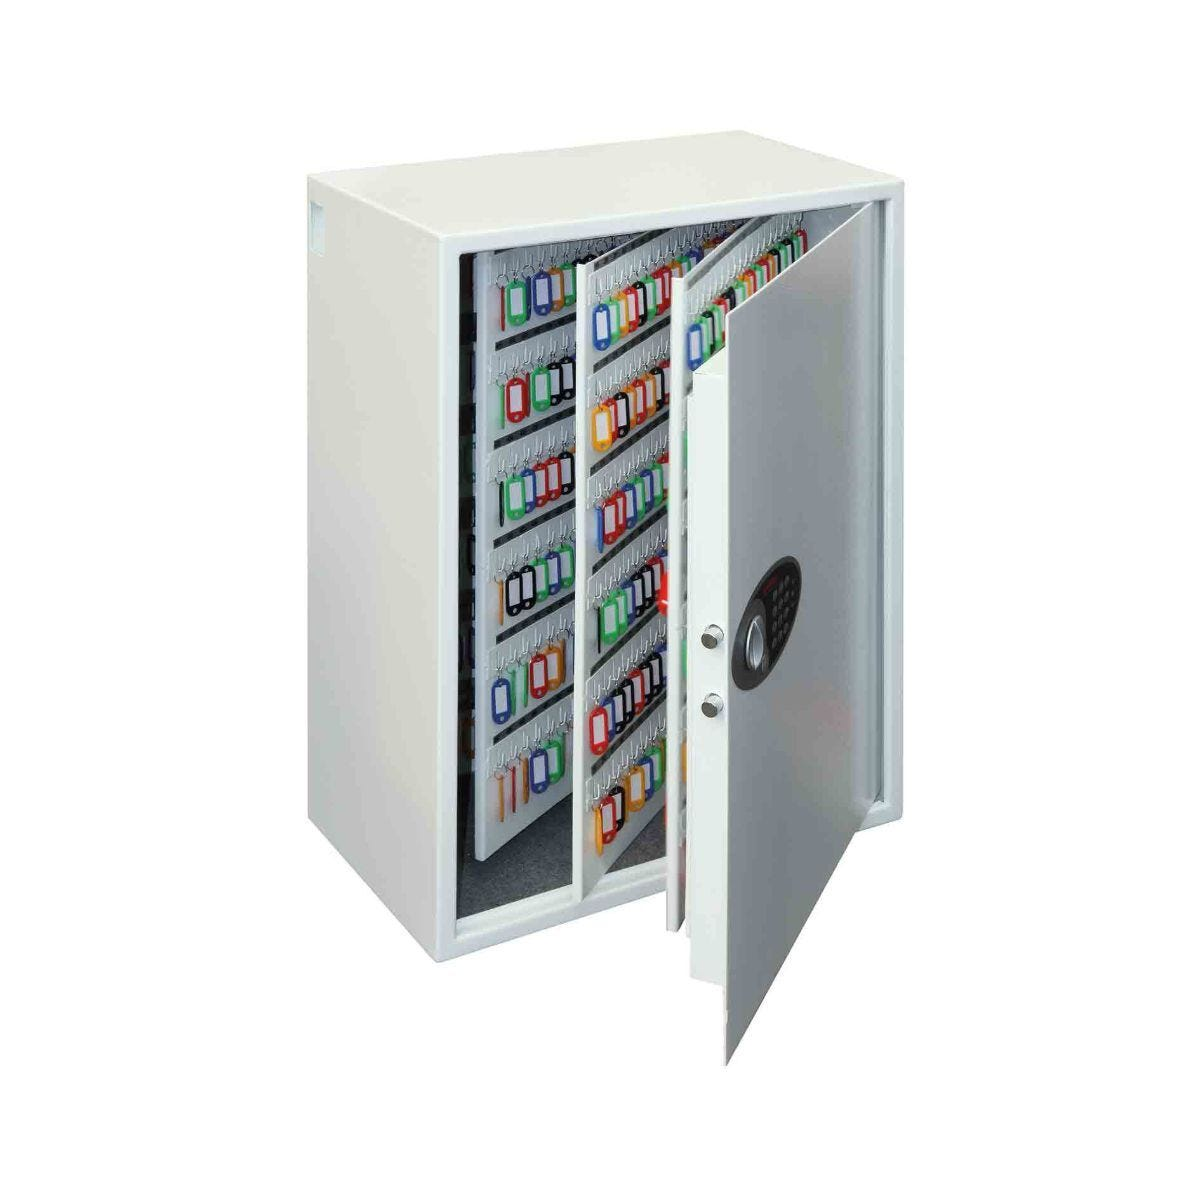 Phoenix Cygnus KS0036E Key Deposit Safe with Electronic Lock 700 Hook